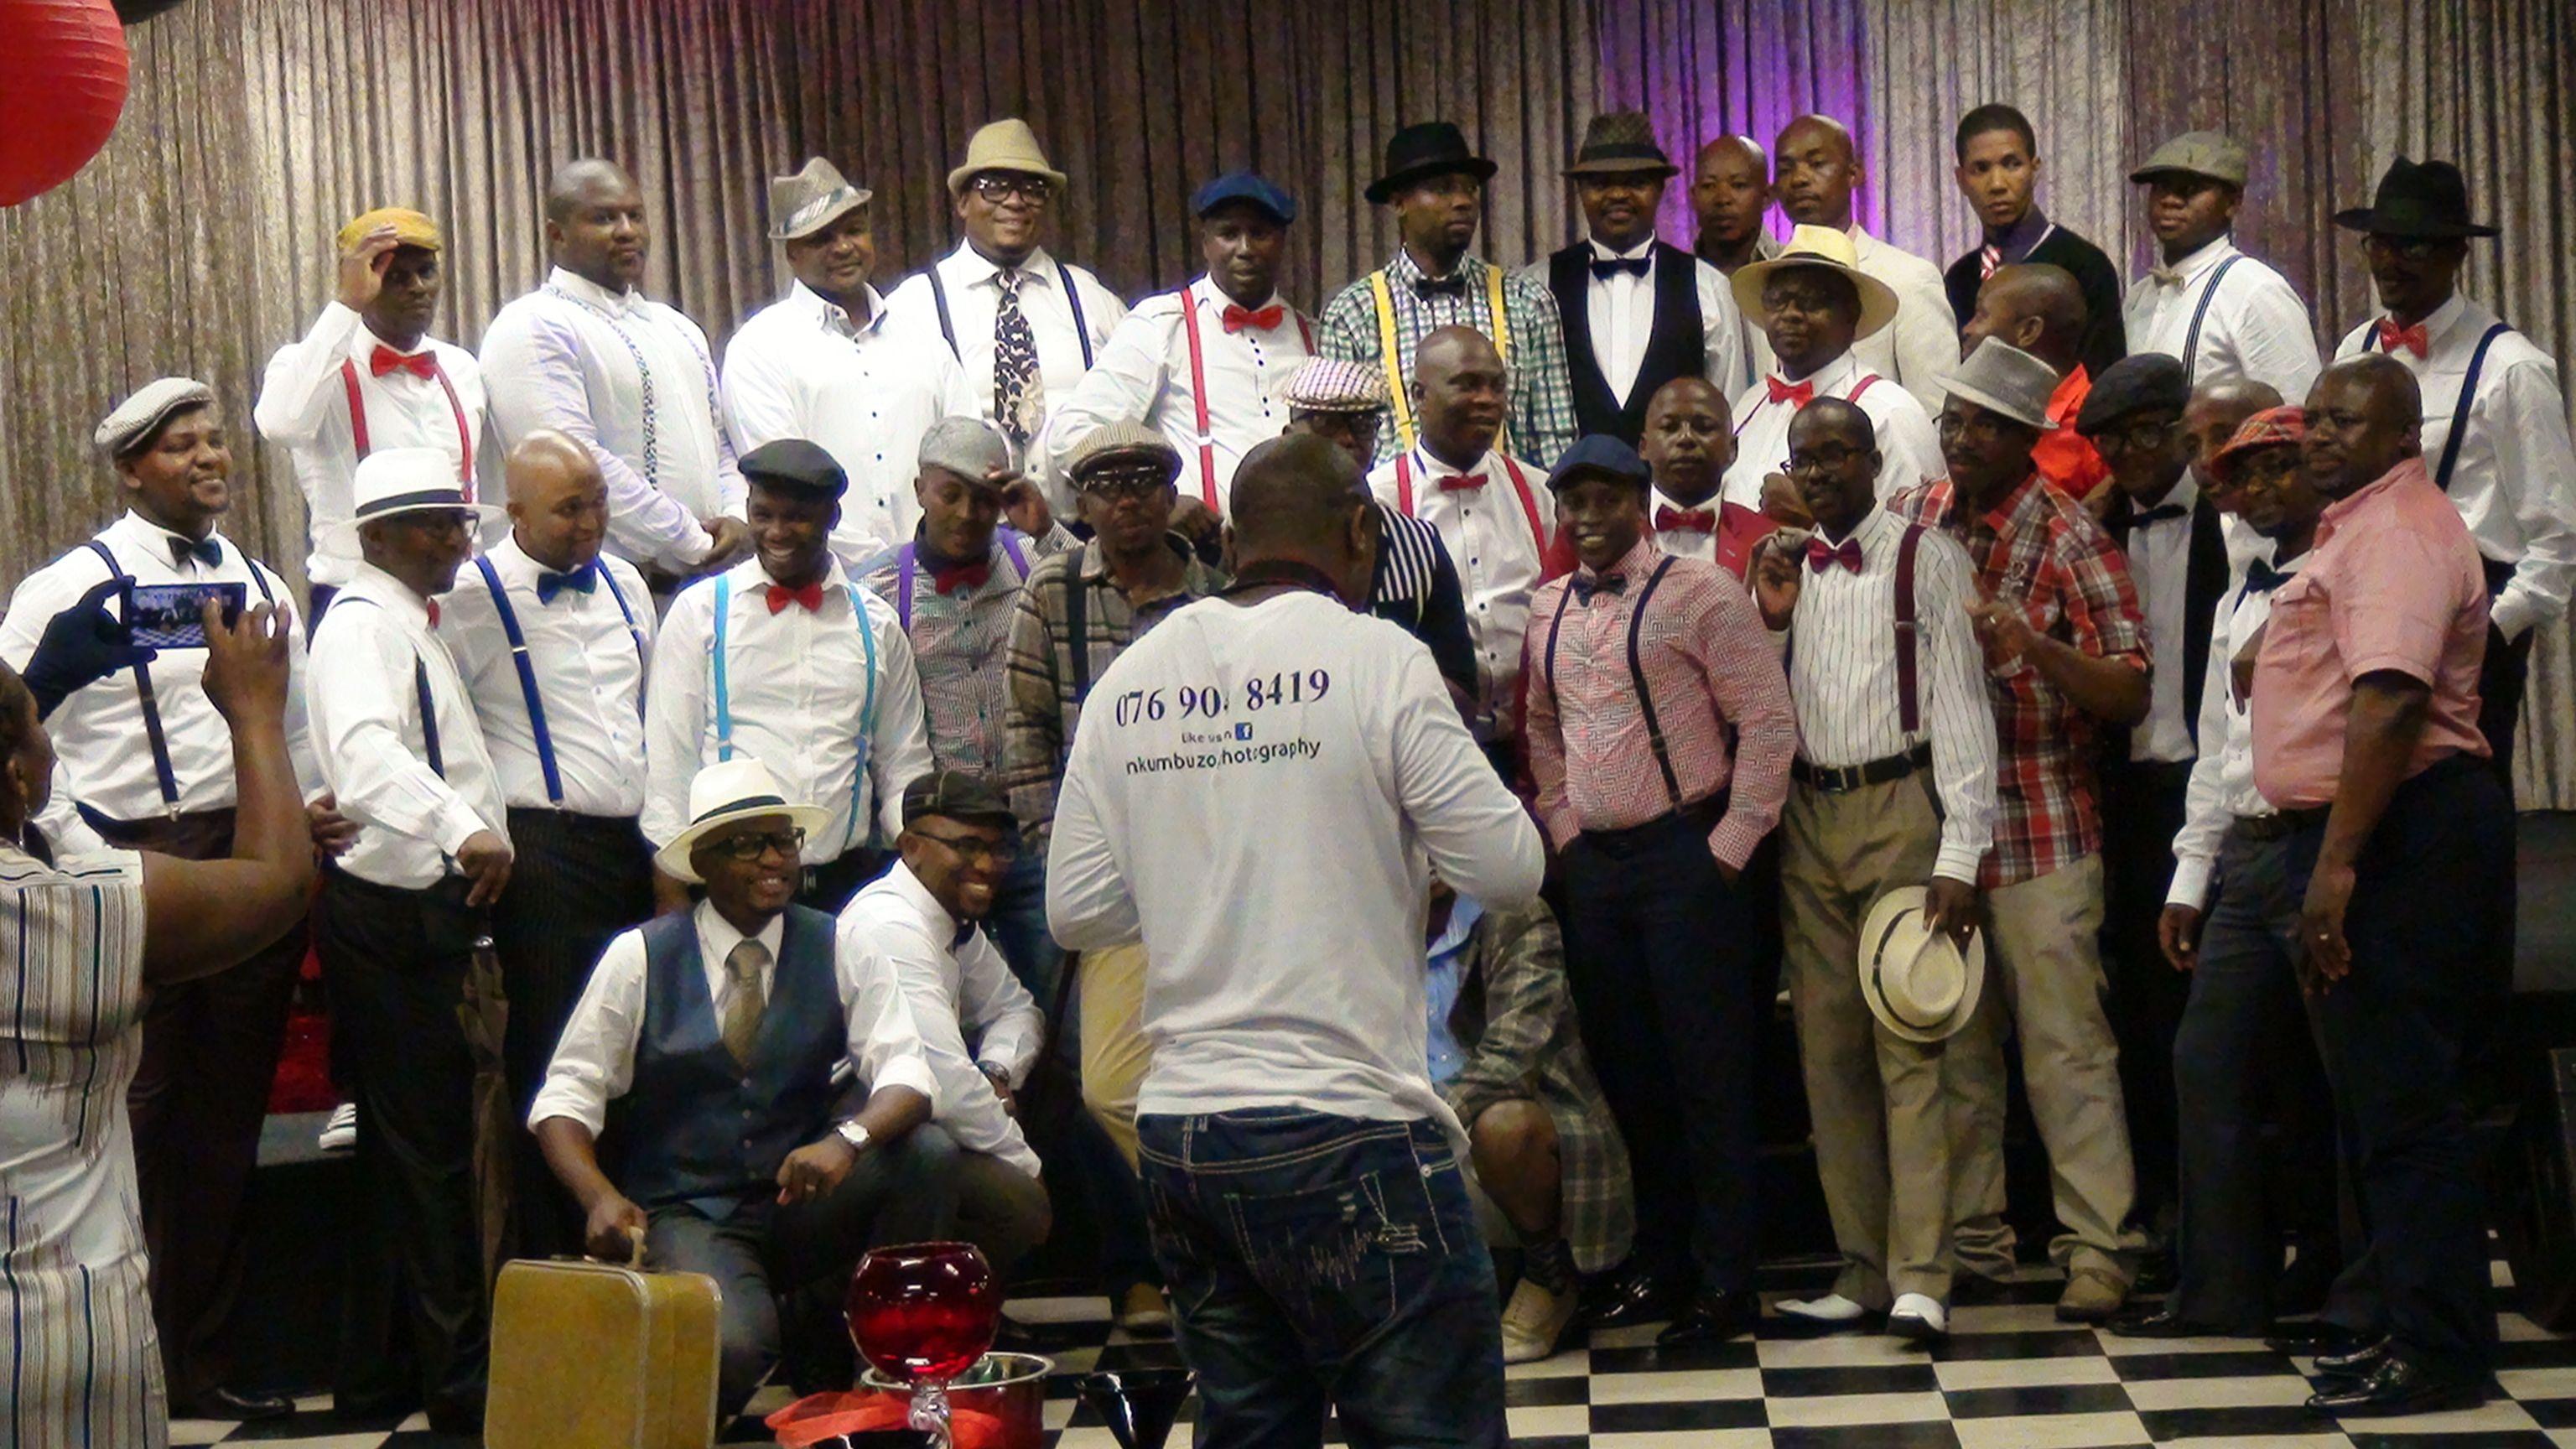 Gentlemen at RUCC PE, Sophiatown Theme! | South African ...